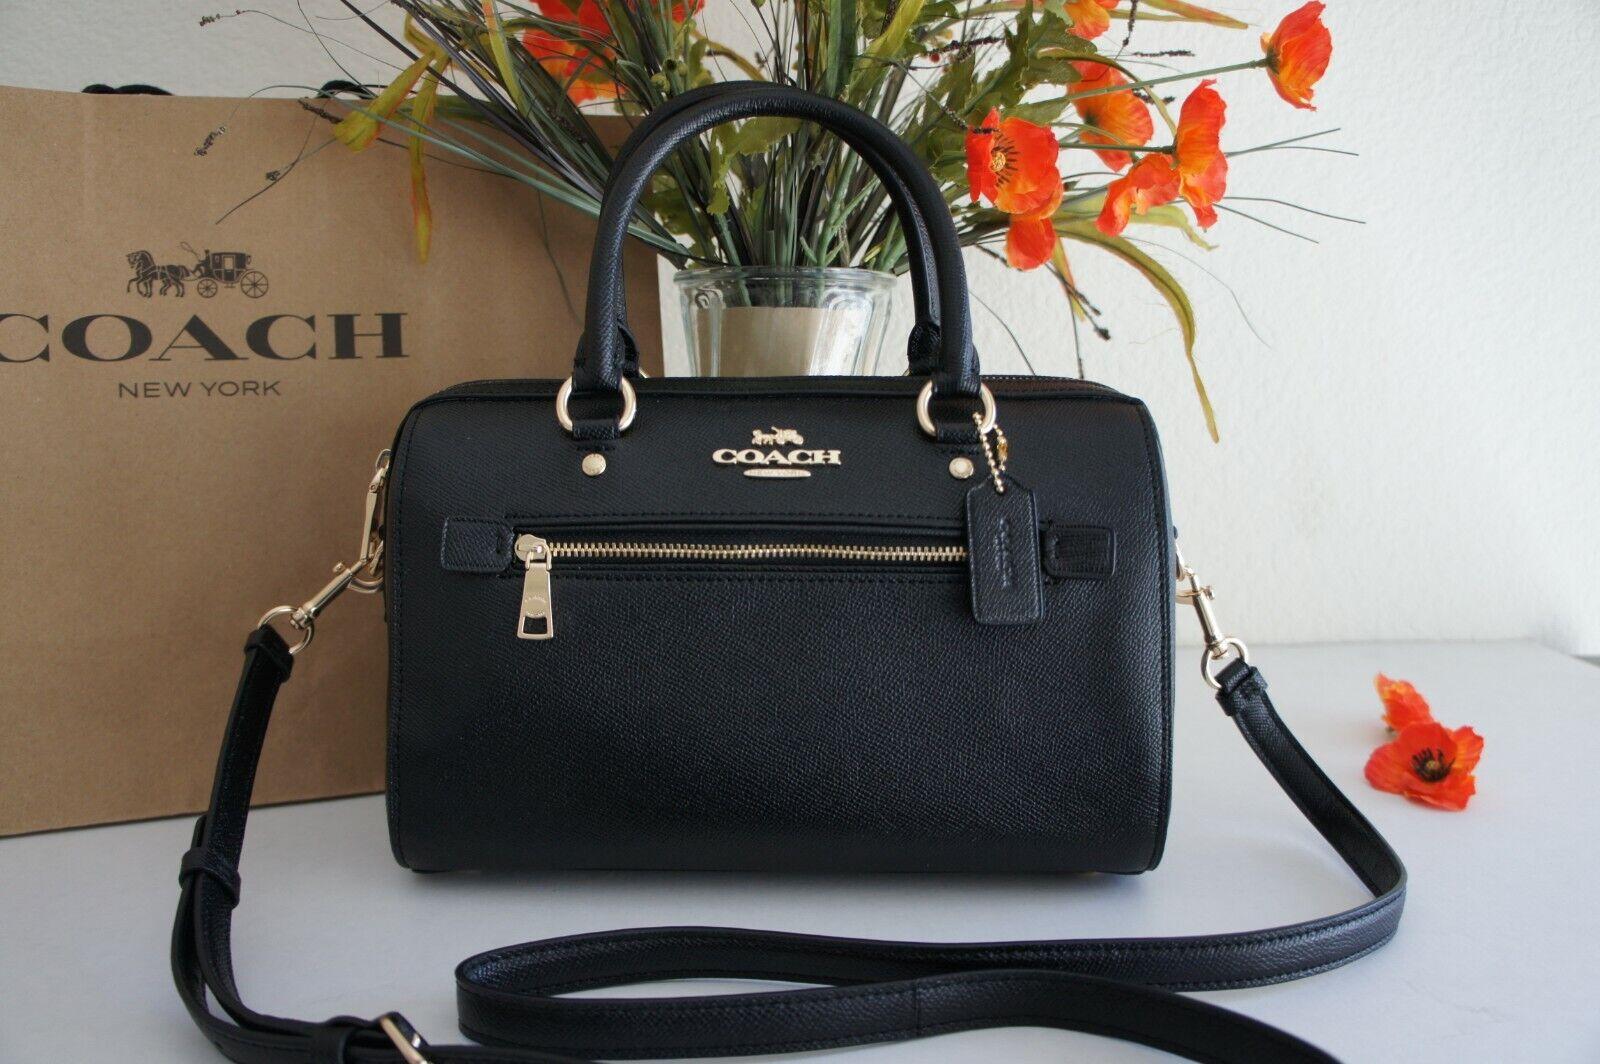 NWT COACH F79946 Crossgrain Leather Rowan Satchel Handbag Pu